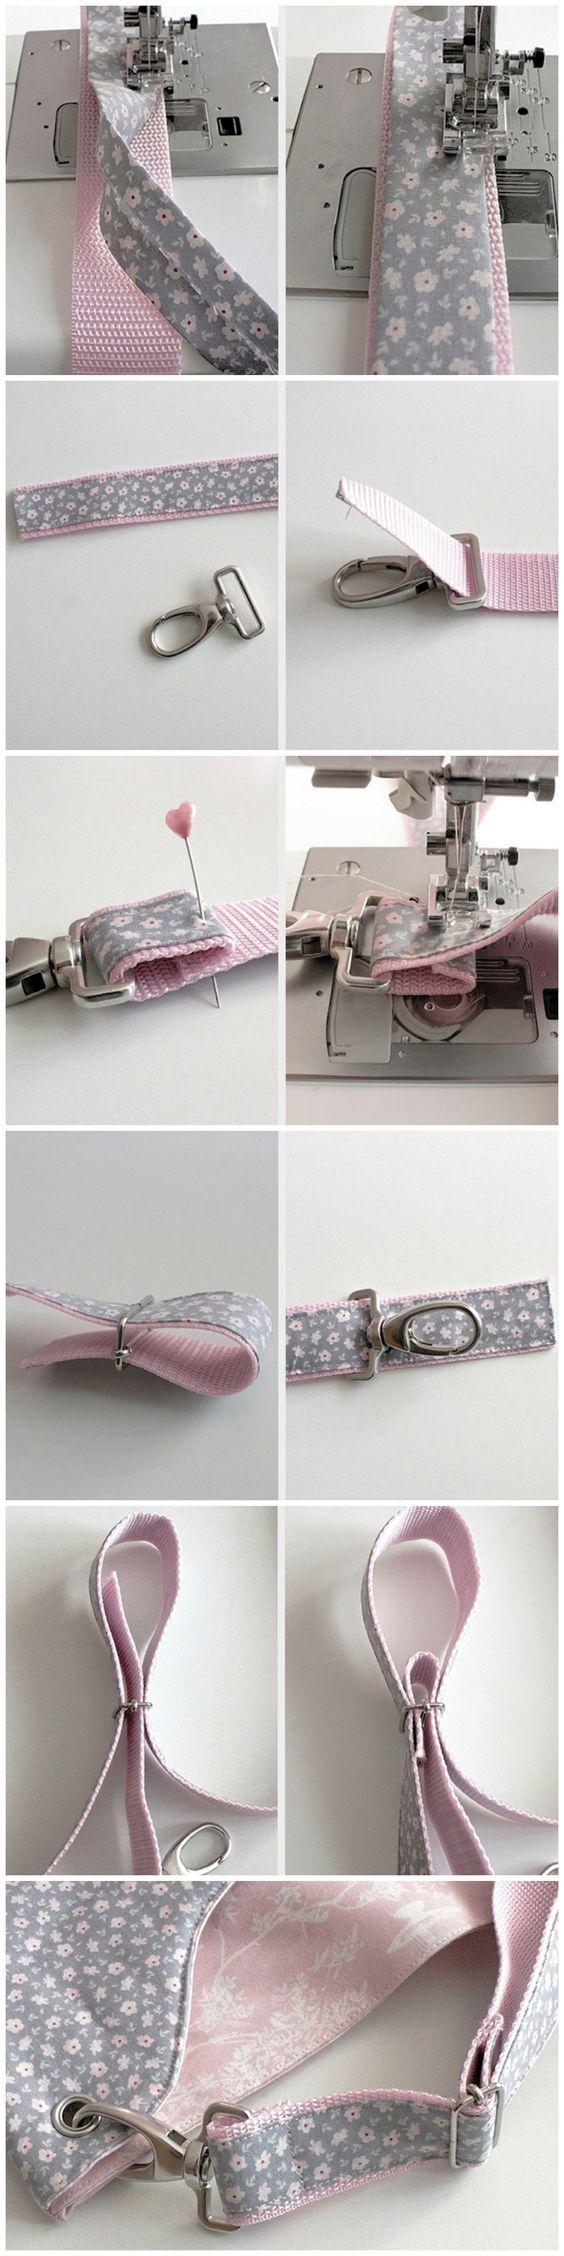 10 Stuning Diy Dog Collar Ideas You Will Love >> ❤ See more: http://fallinpets.com/stuning-diy-dog-collar-ideas-will-love/ ❤ See more: http://fallinpets.com/diy-dog-feeding-station-ideas-pet-will-like/ #DogAccessories #dogdiyideas